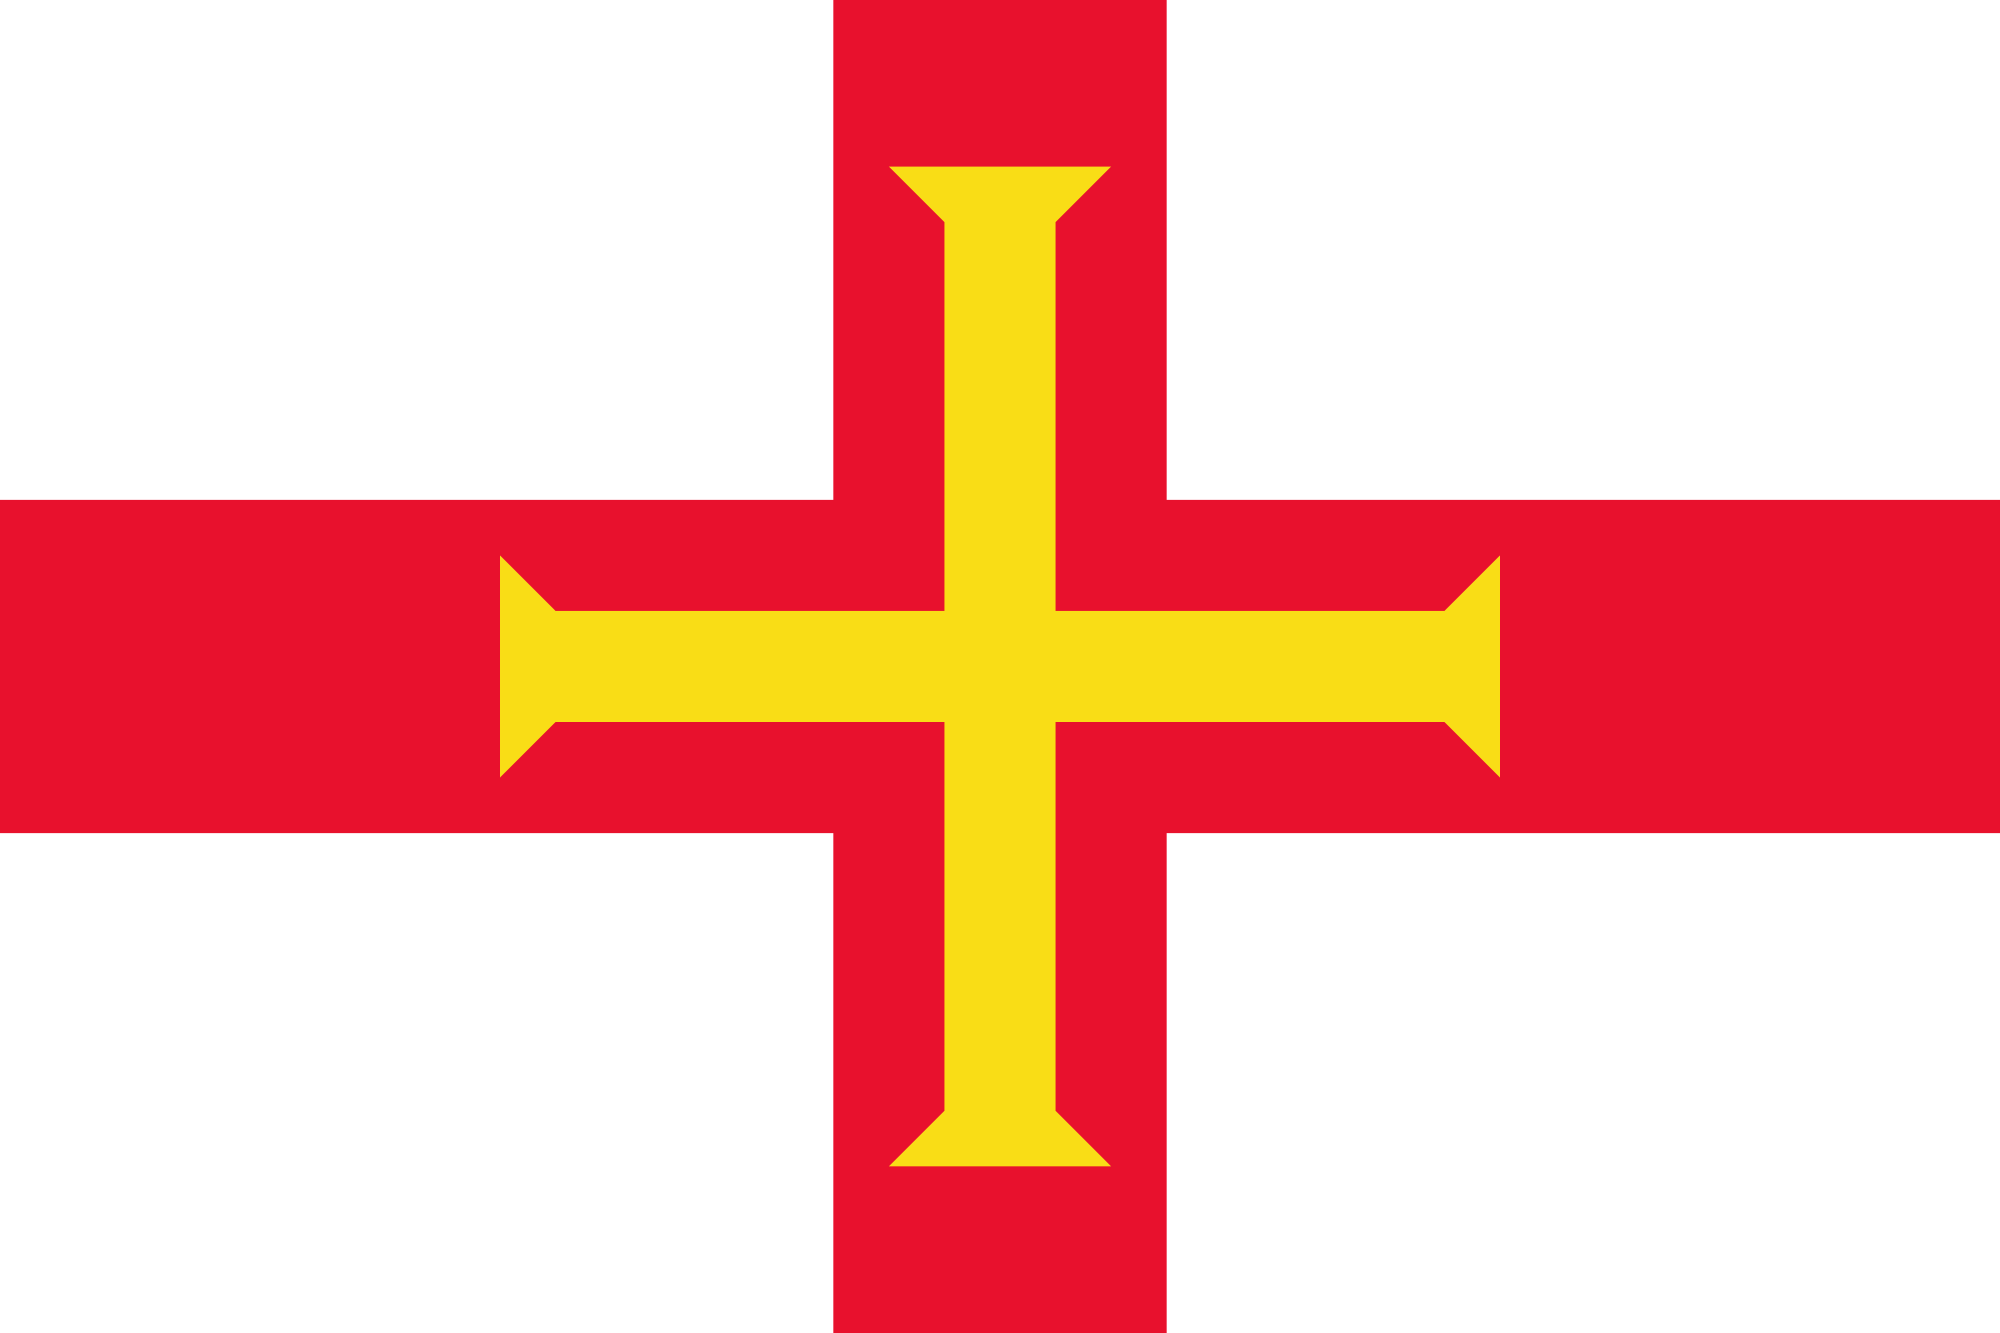 guernsey, paese, emblema, logo, simbolo - Sfondi HD - Professor-falken.com